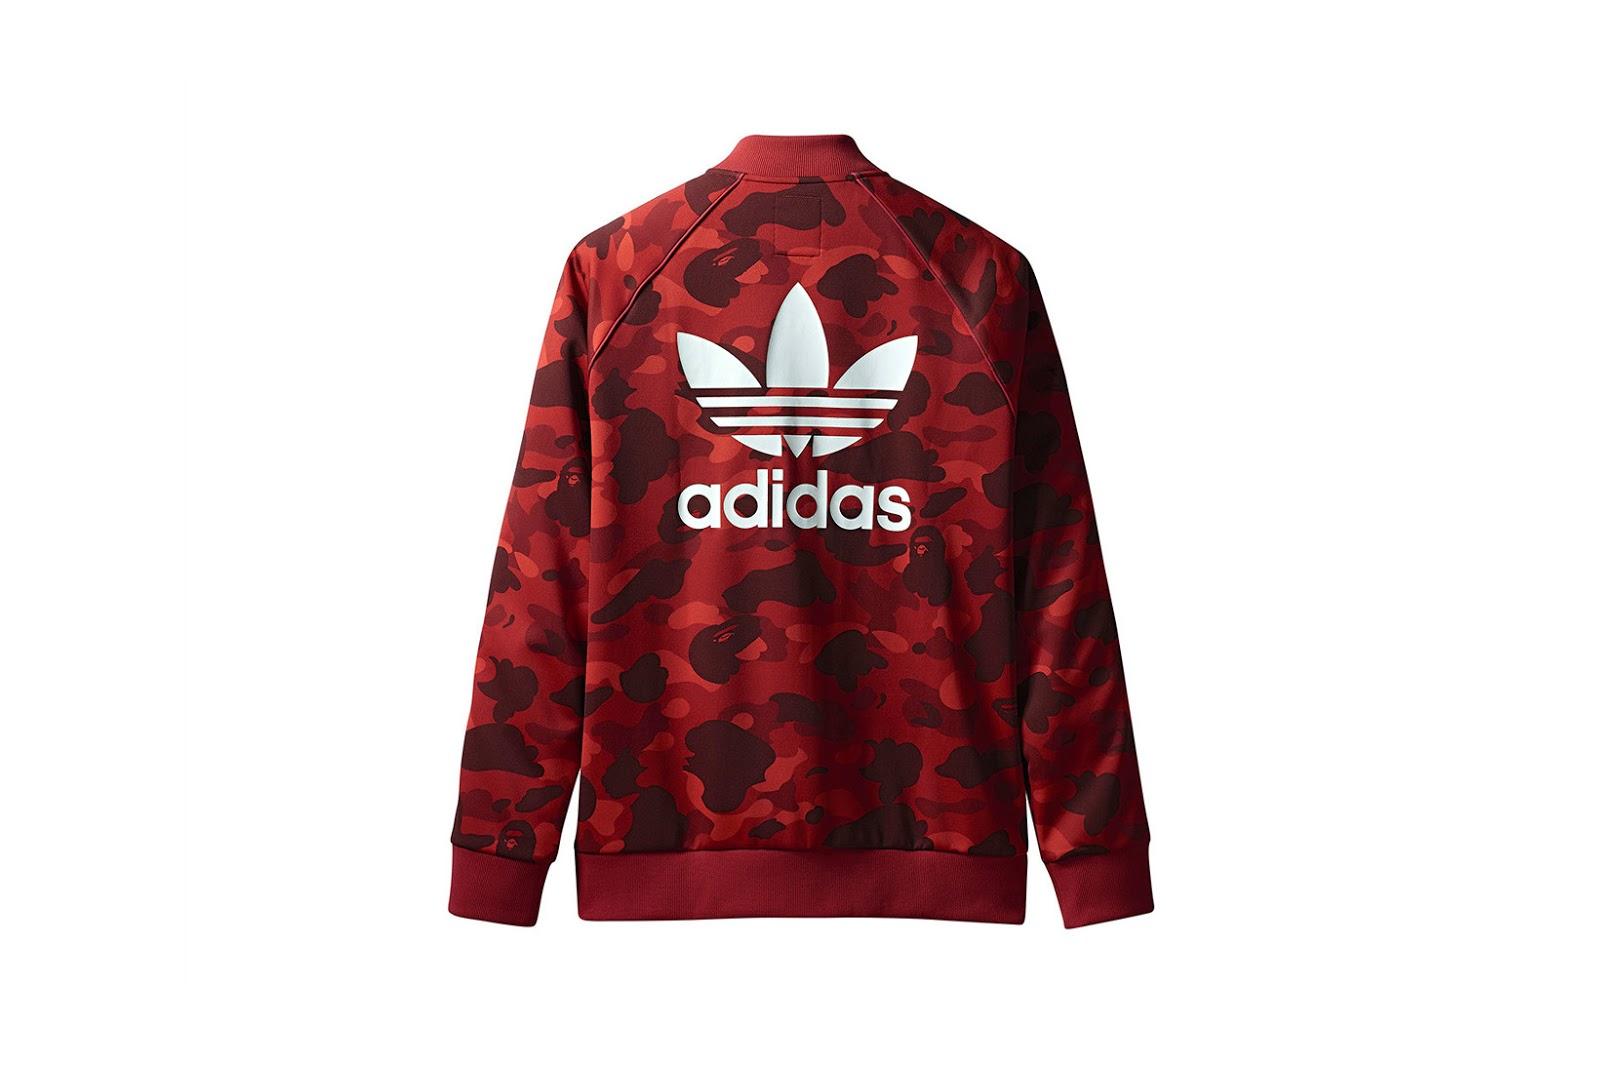 Eniwhere Fashion - News on Fashion - Adidas